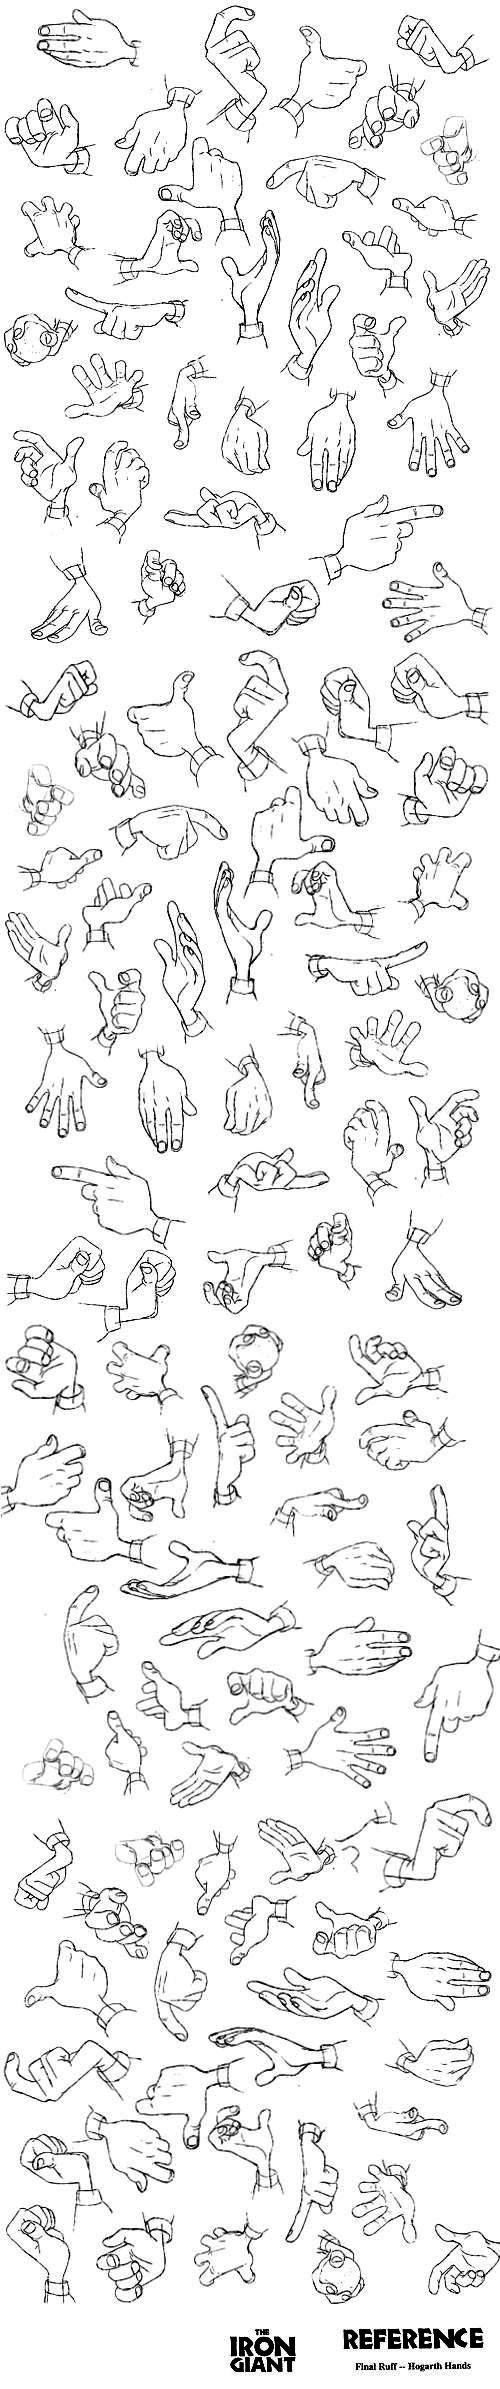 Character Anatomy Hands_4 (500x2389)